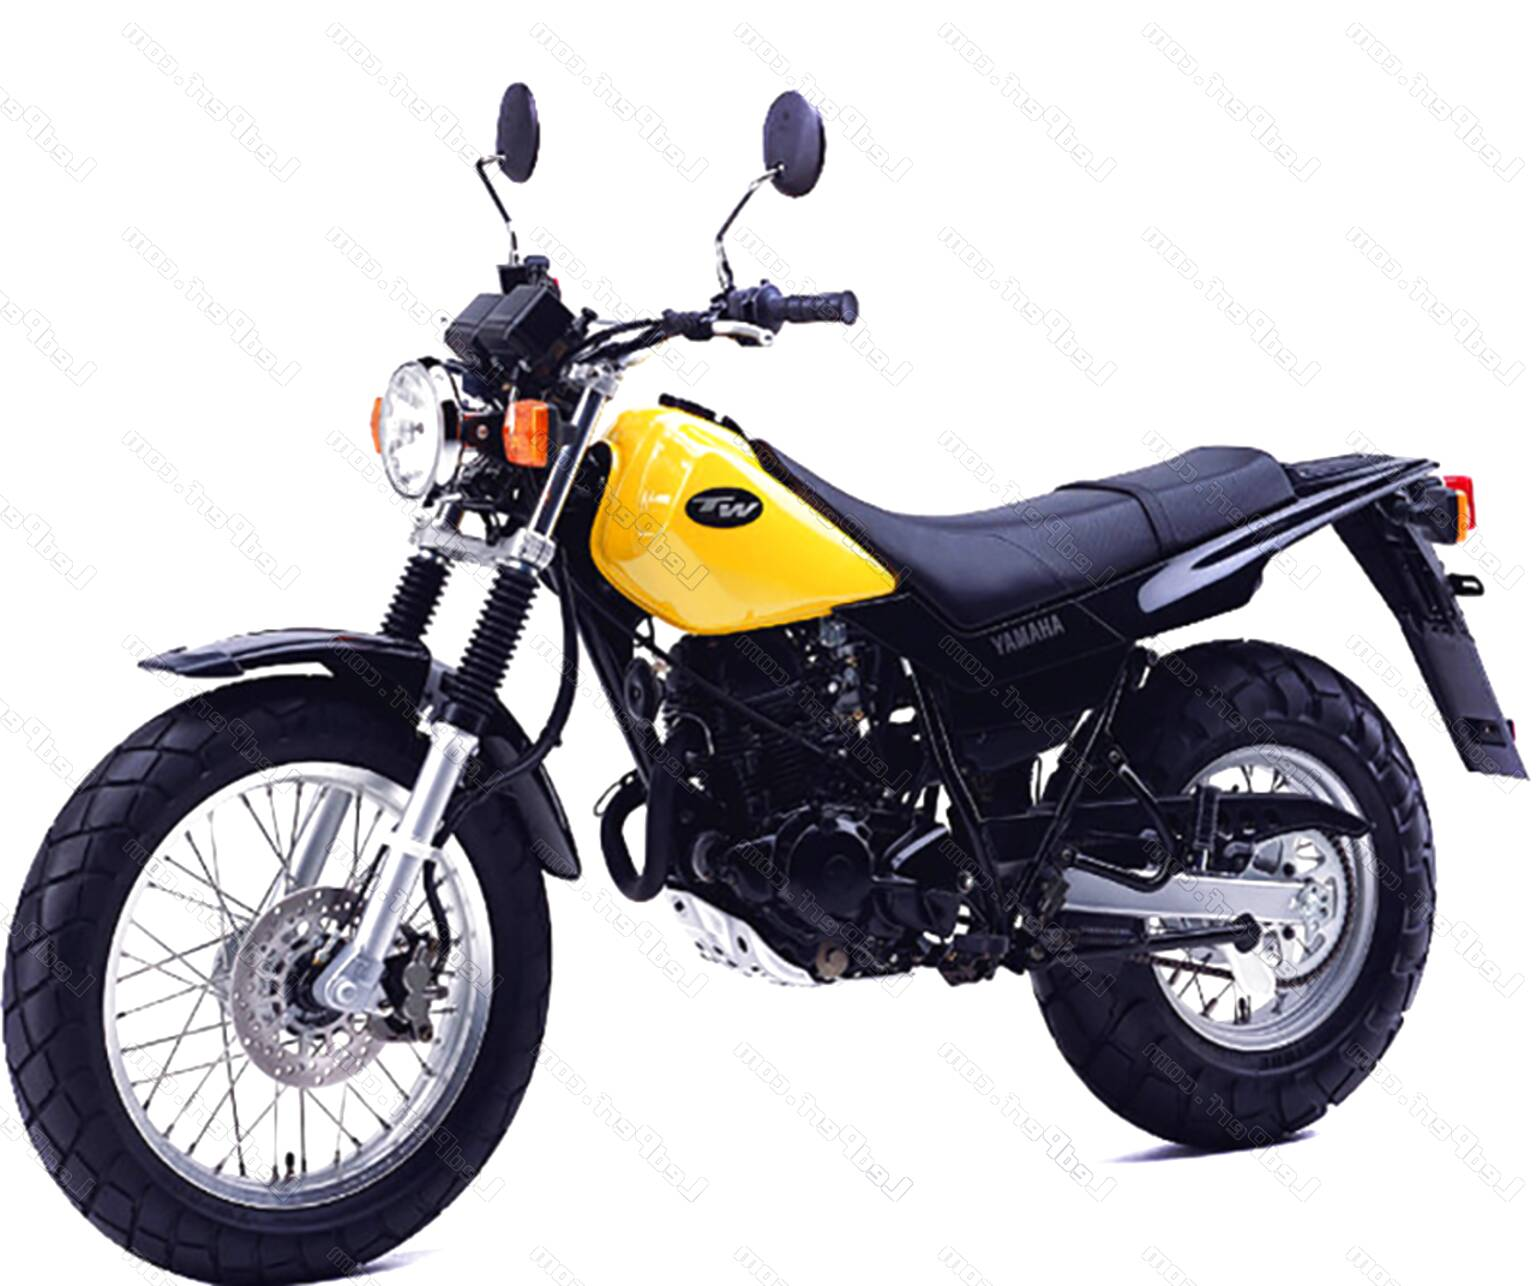 Yamaha Tw 125 For Sale In Uk 61 Used Yamaha Tw 125